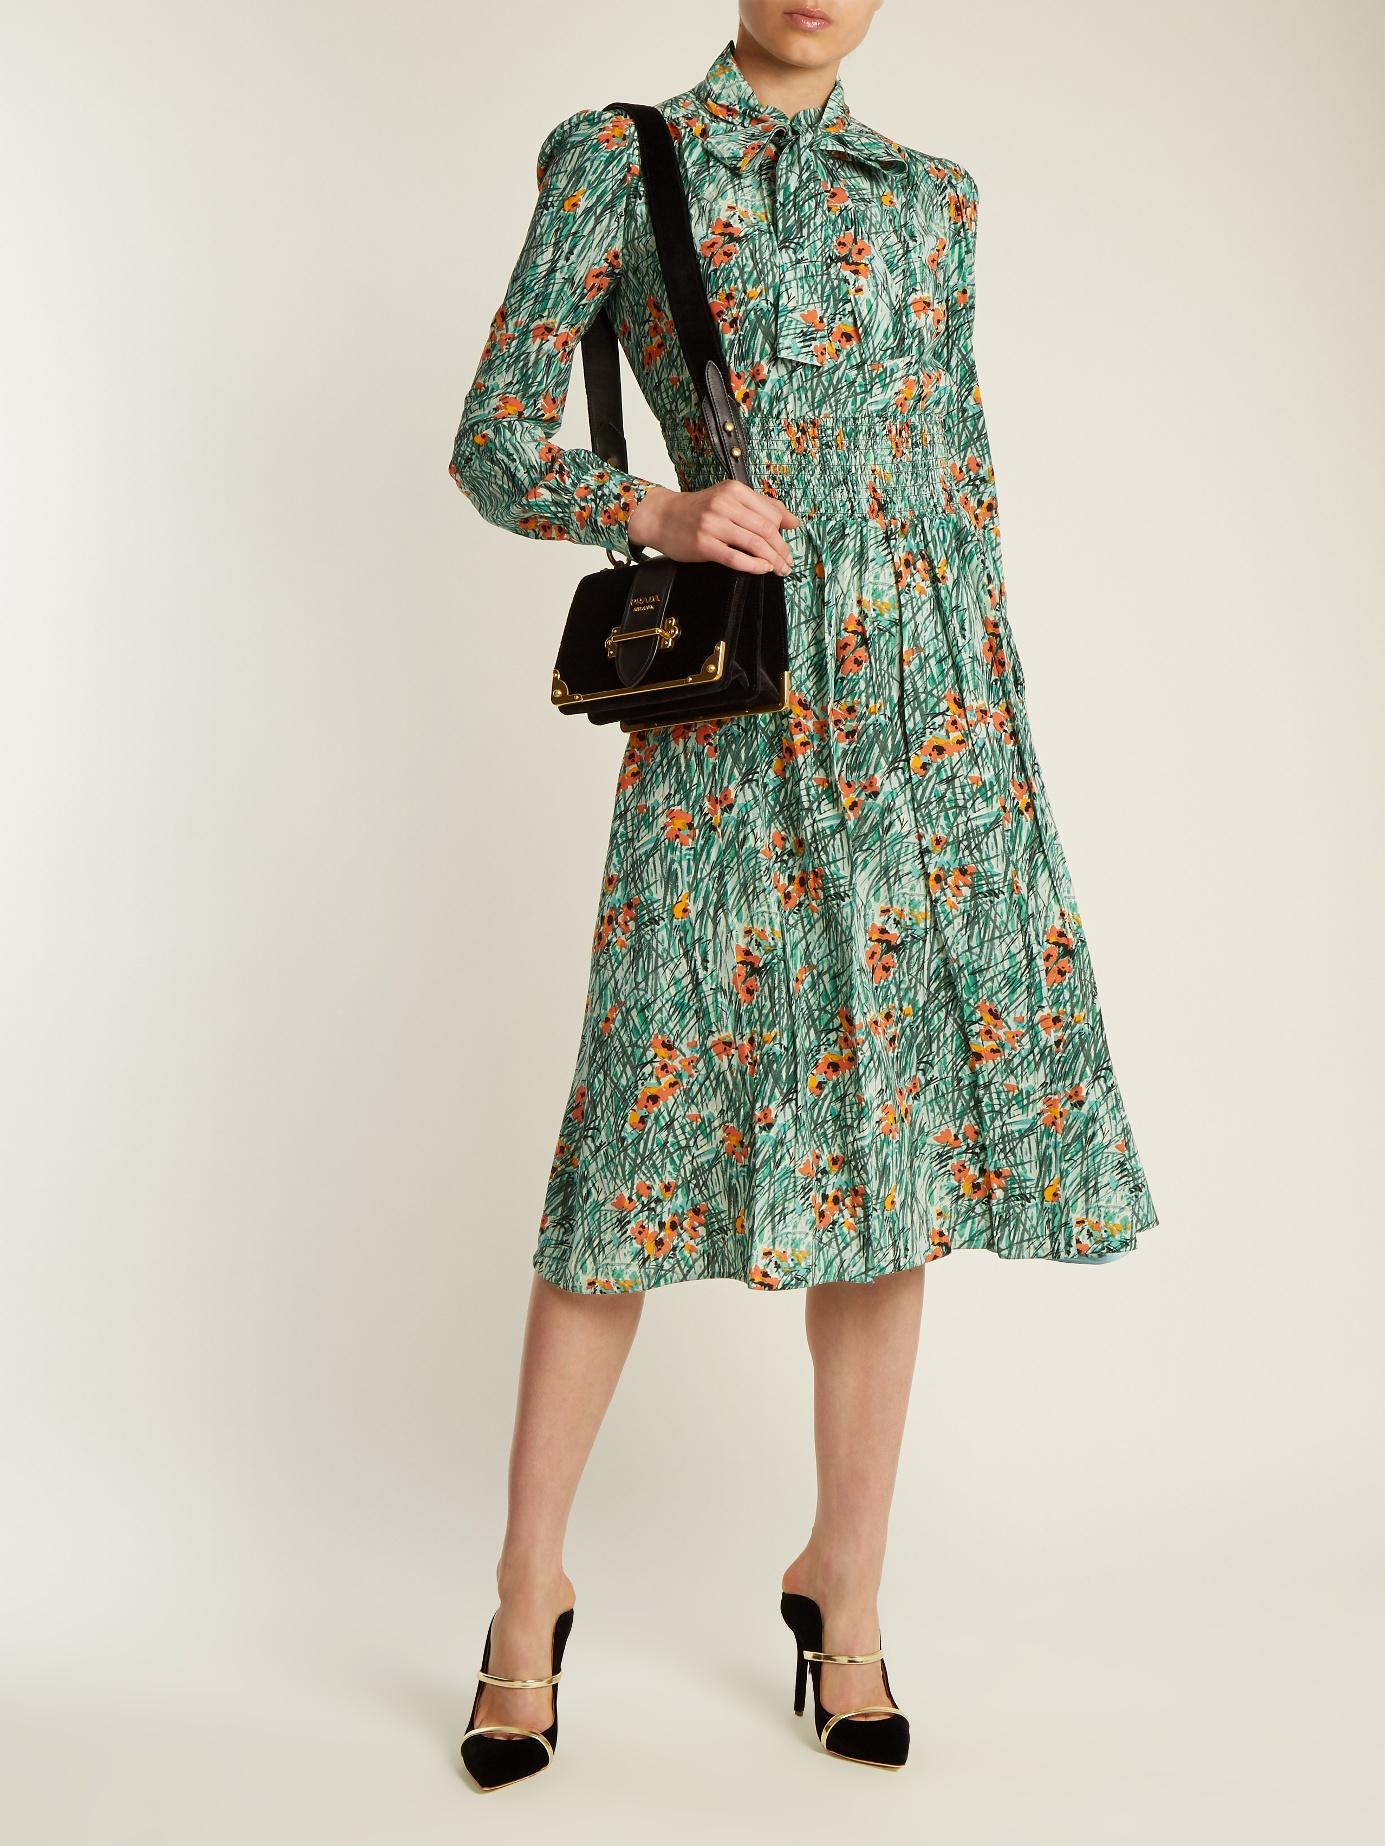 Prada Poppy Print Dress